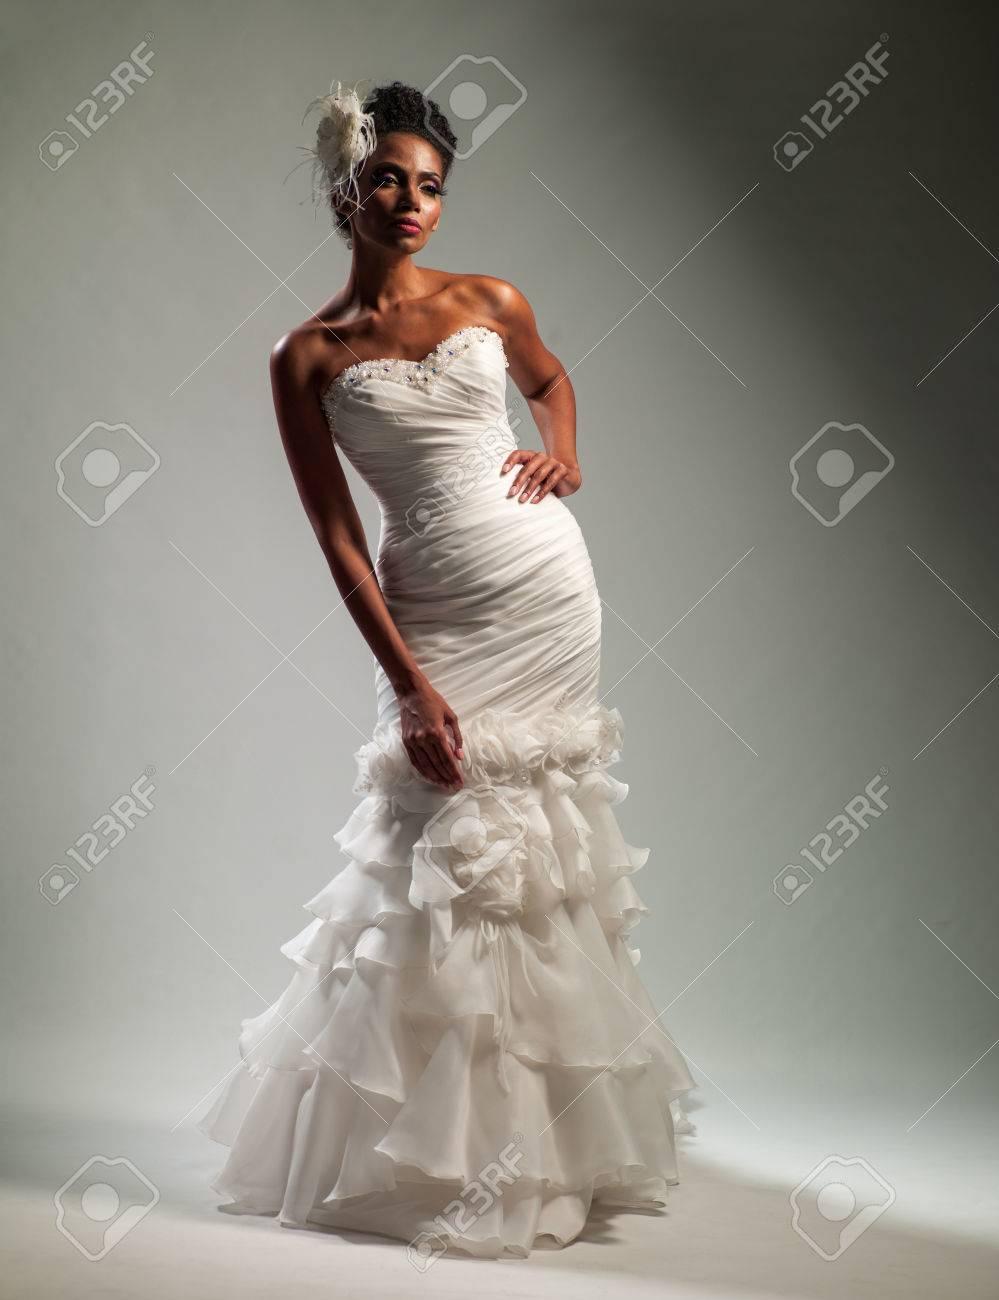 royalty free stock photos black woman wedding dress image african american wedding dresses Black woman in wedding dress